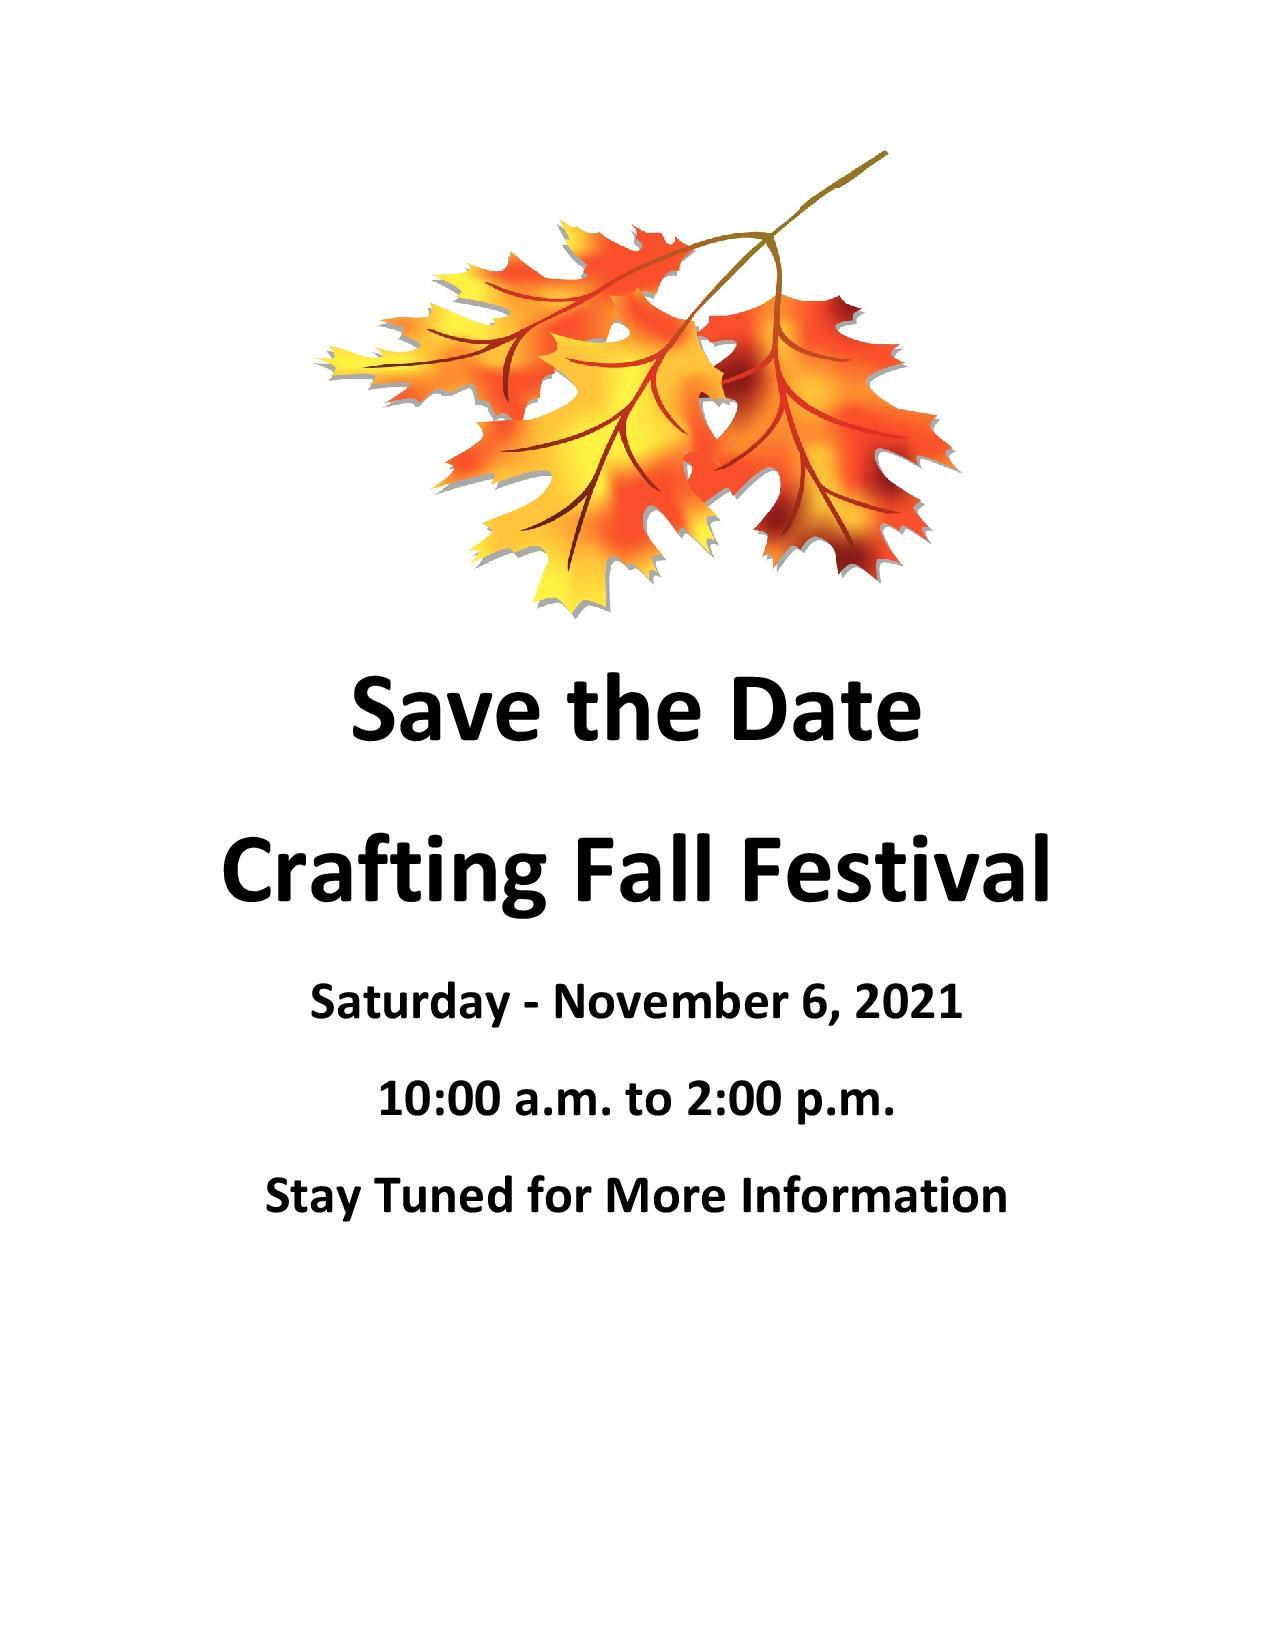 Crafting Fall Festival 2021